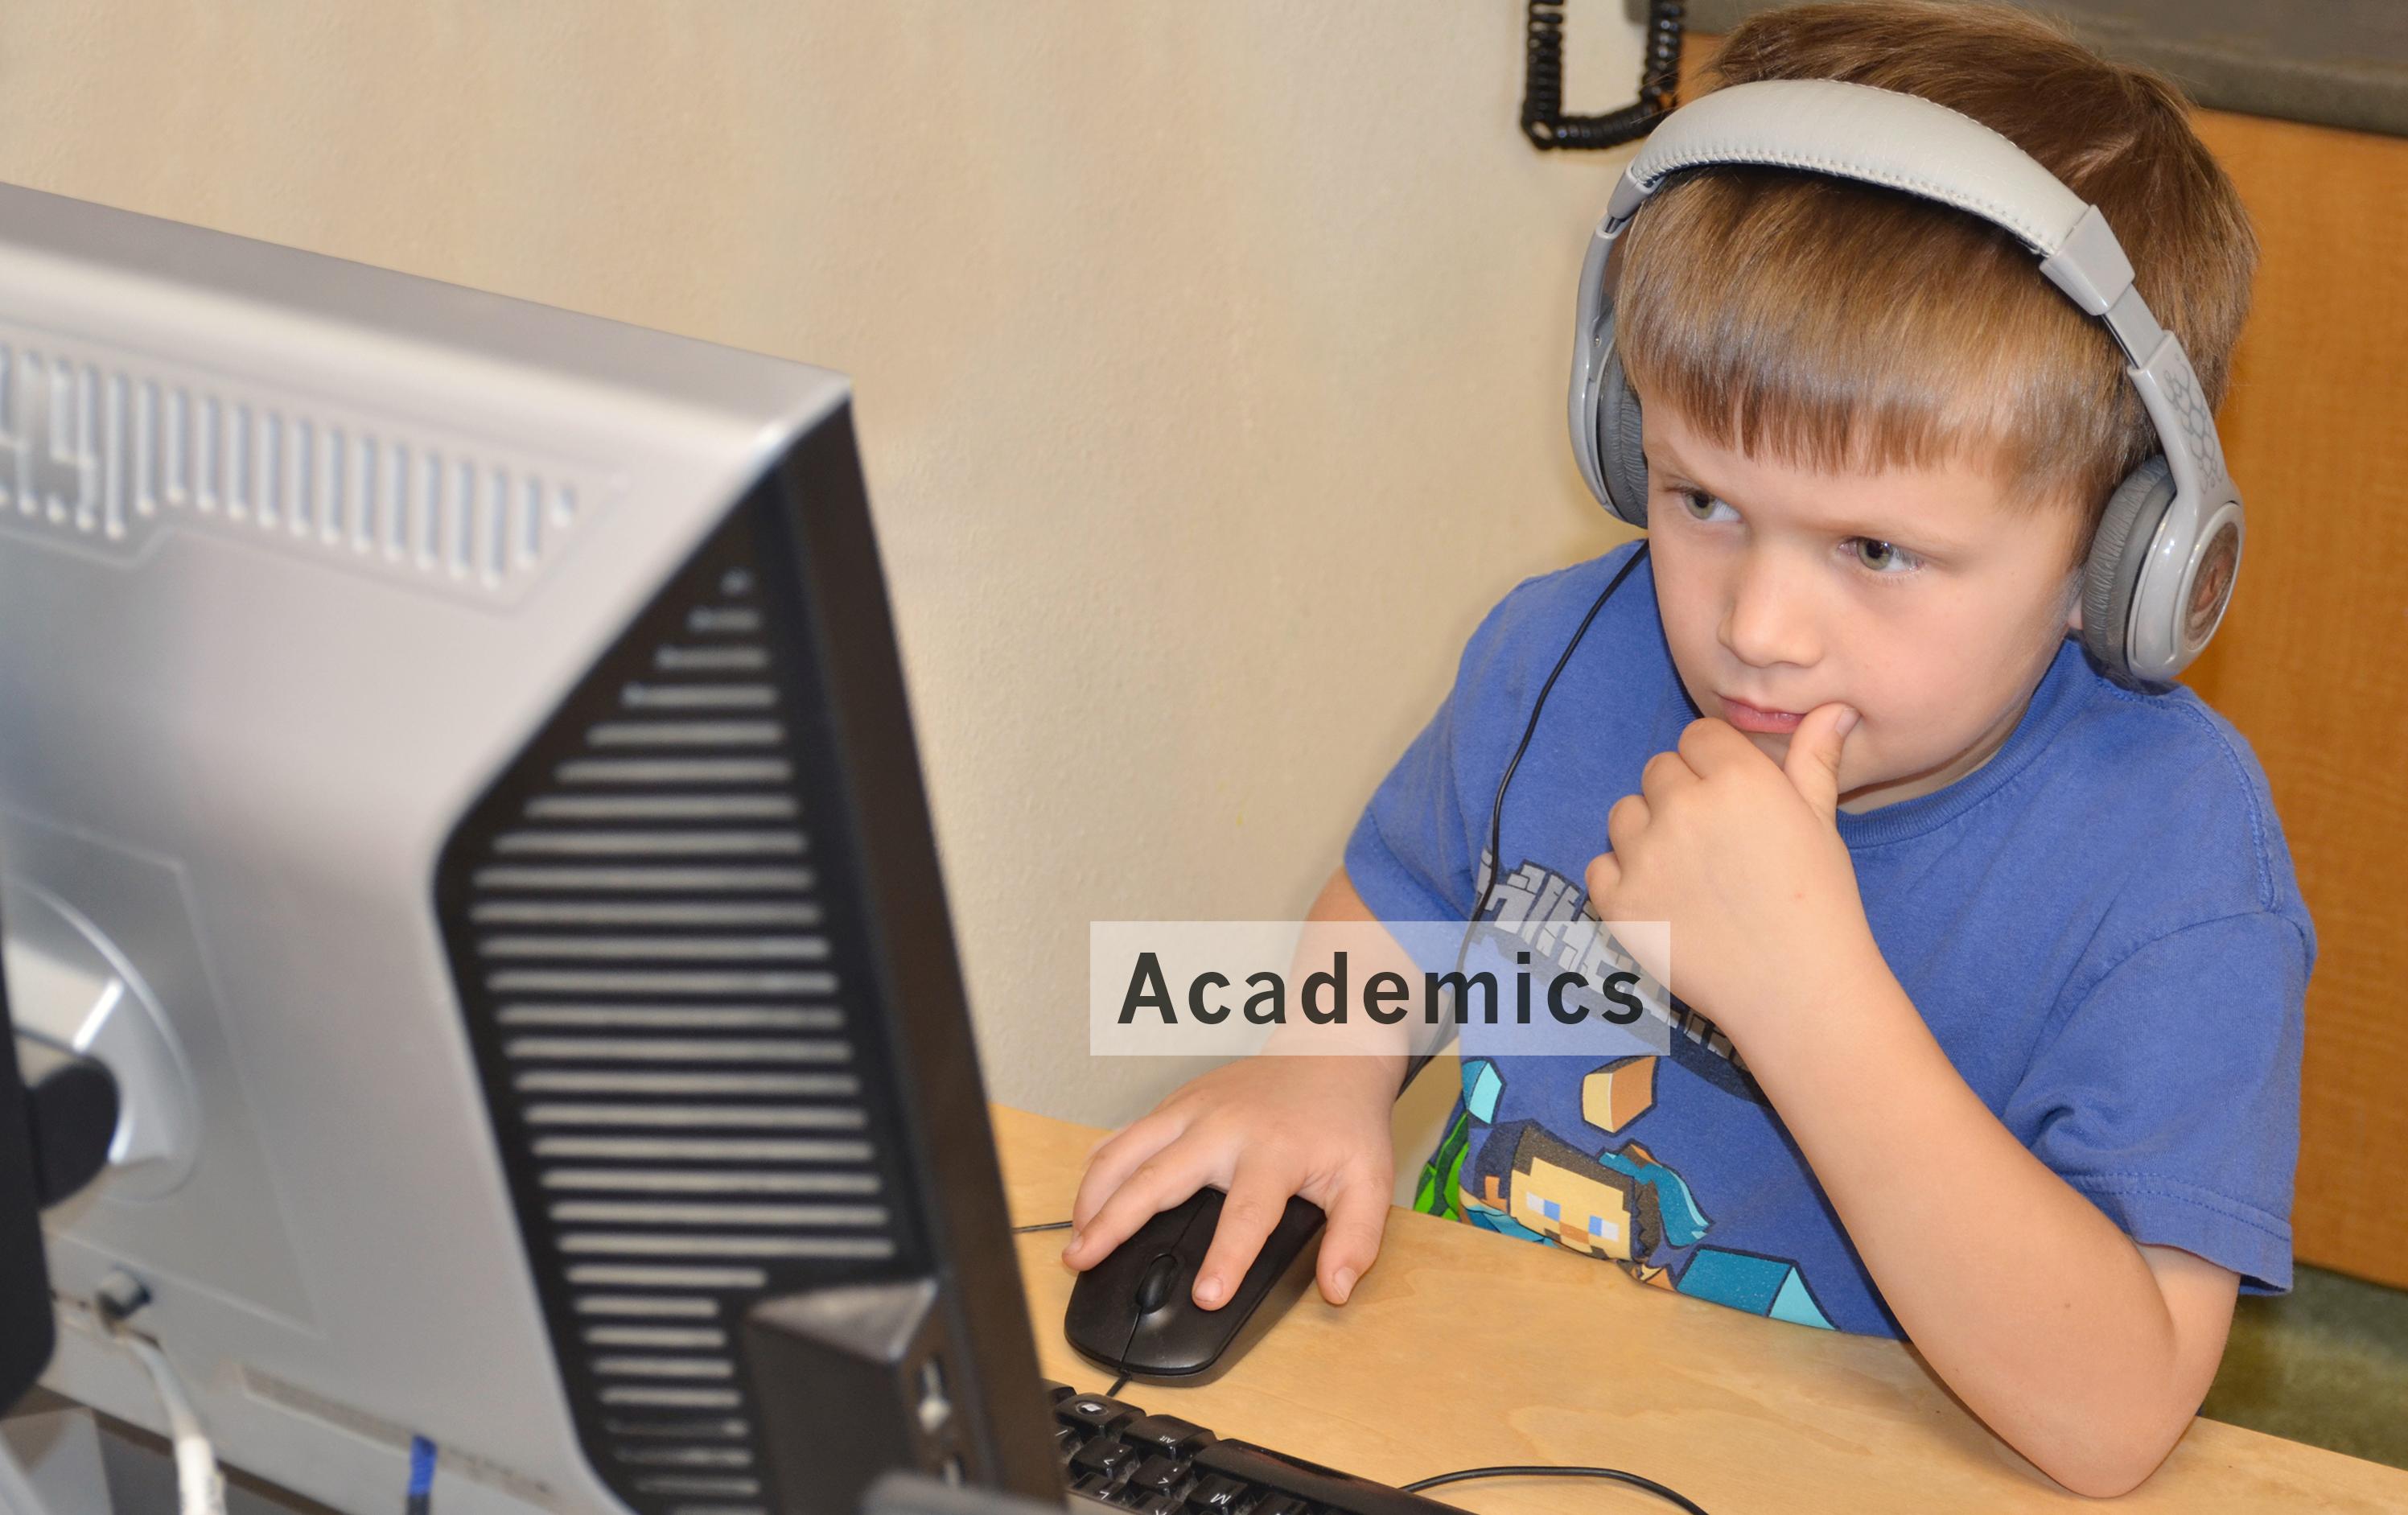 AcademicsDSC_4373afx1